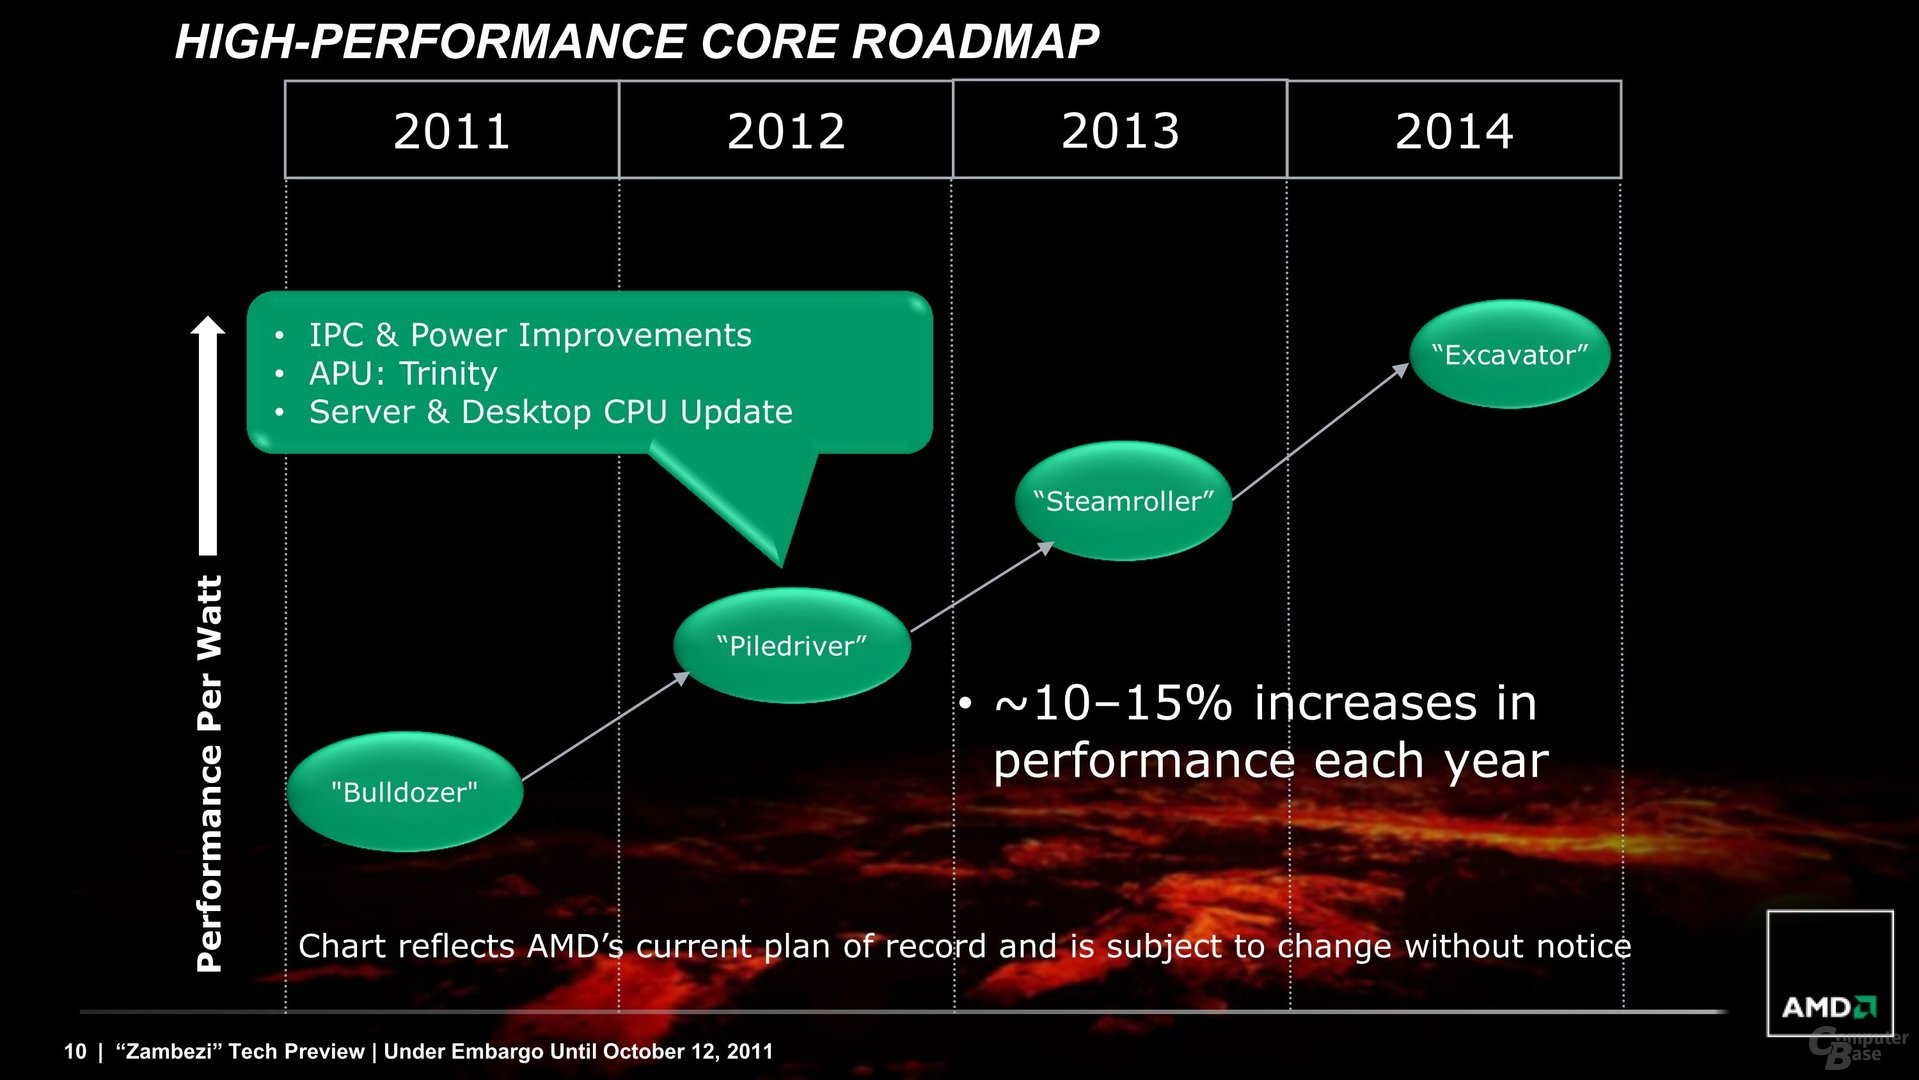 Bereits seit Oktober 2011 bekannte Roadmap